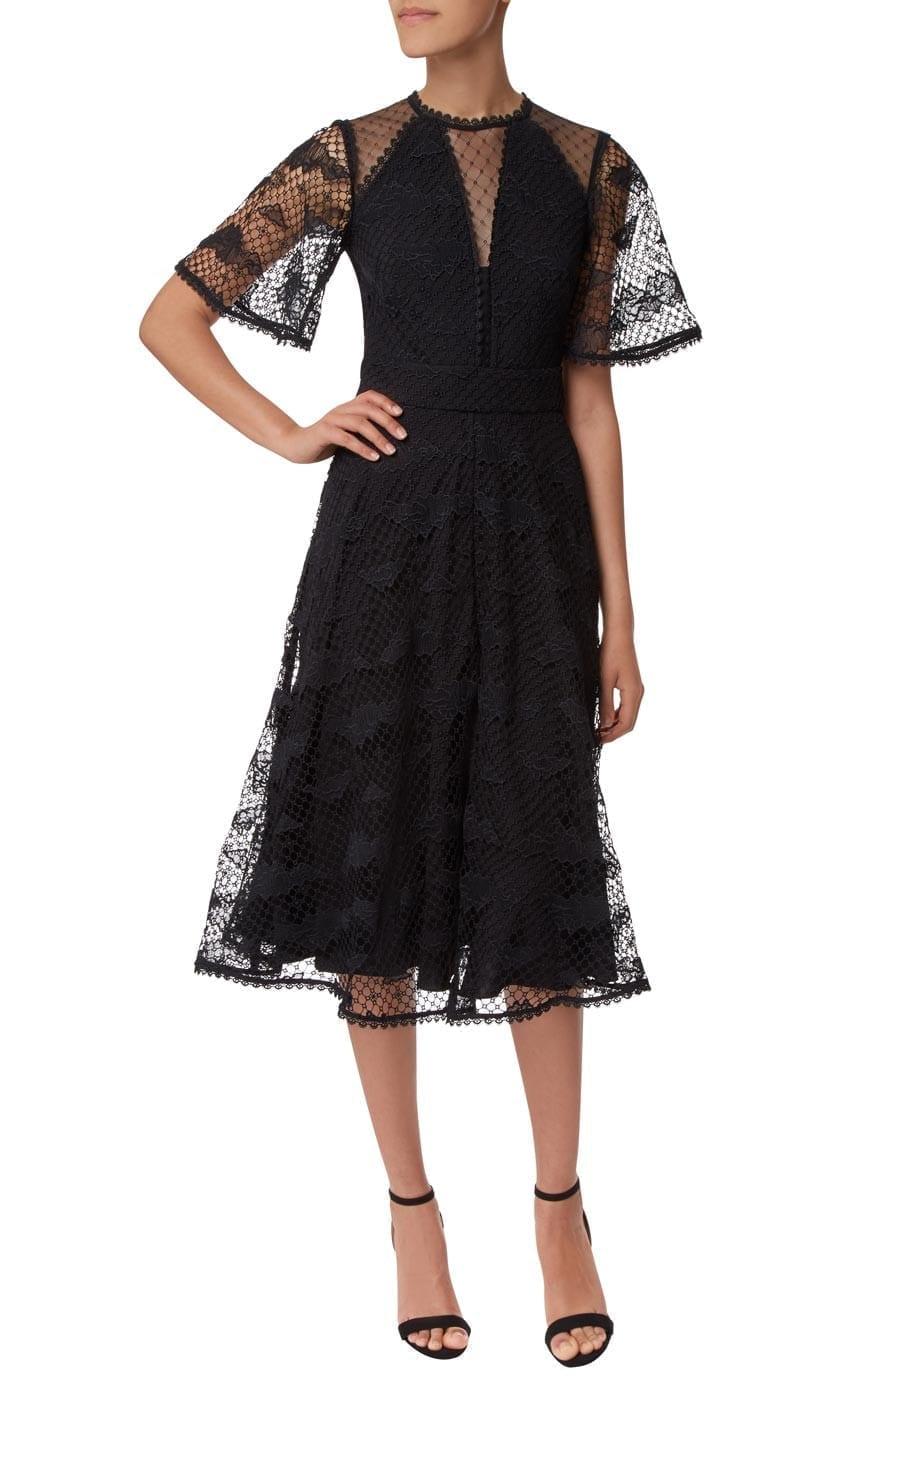 TEMPERLEY LONDON Haze Lace Sleeved Black Dress